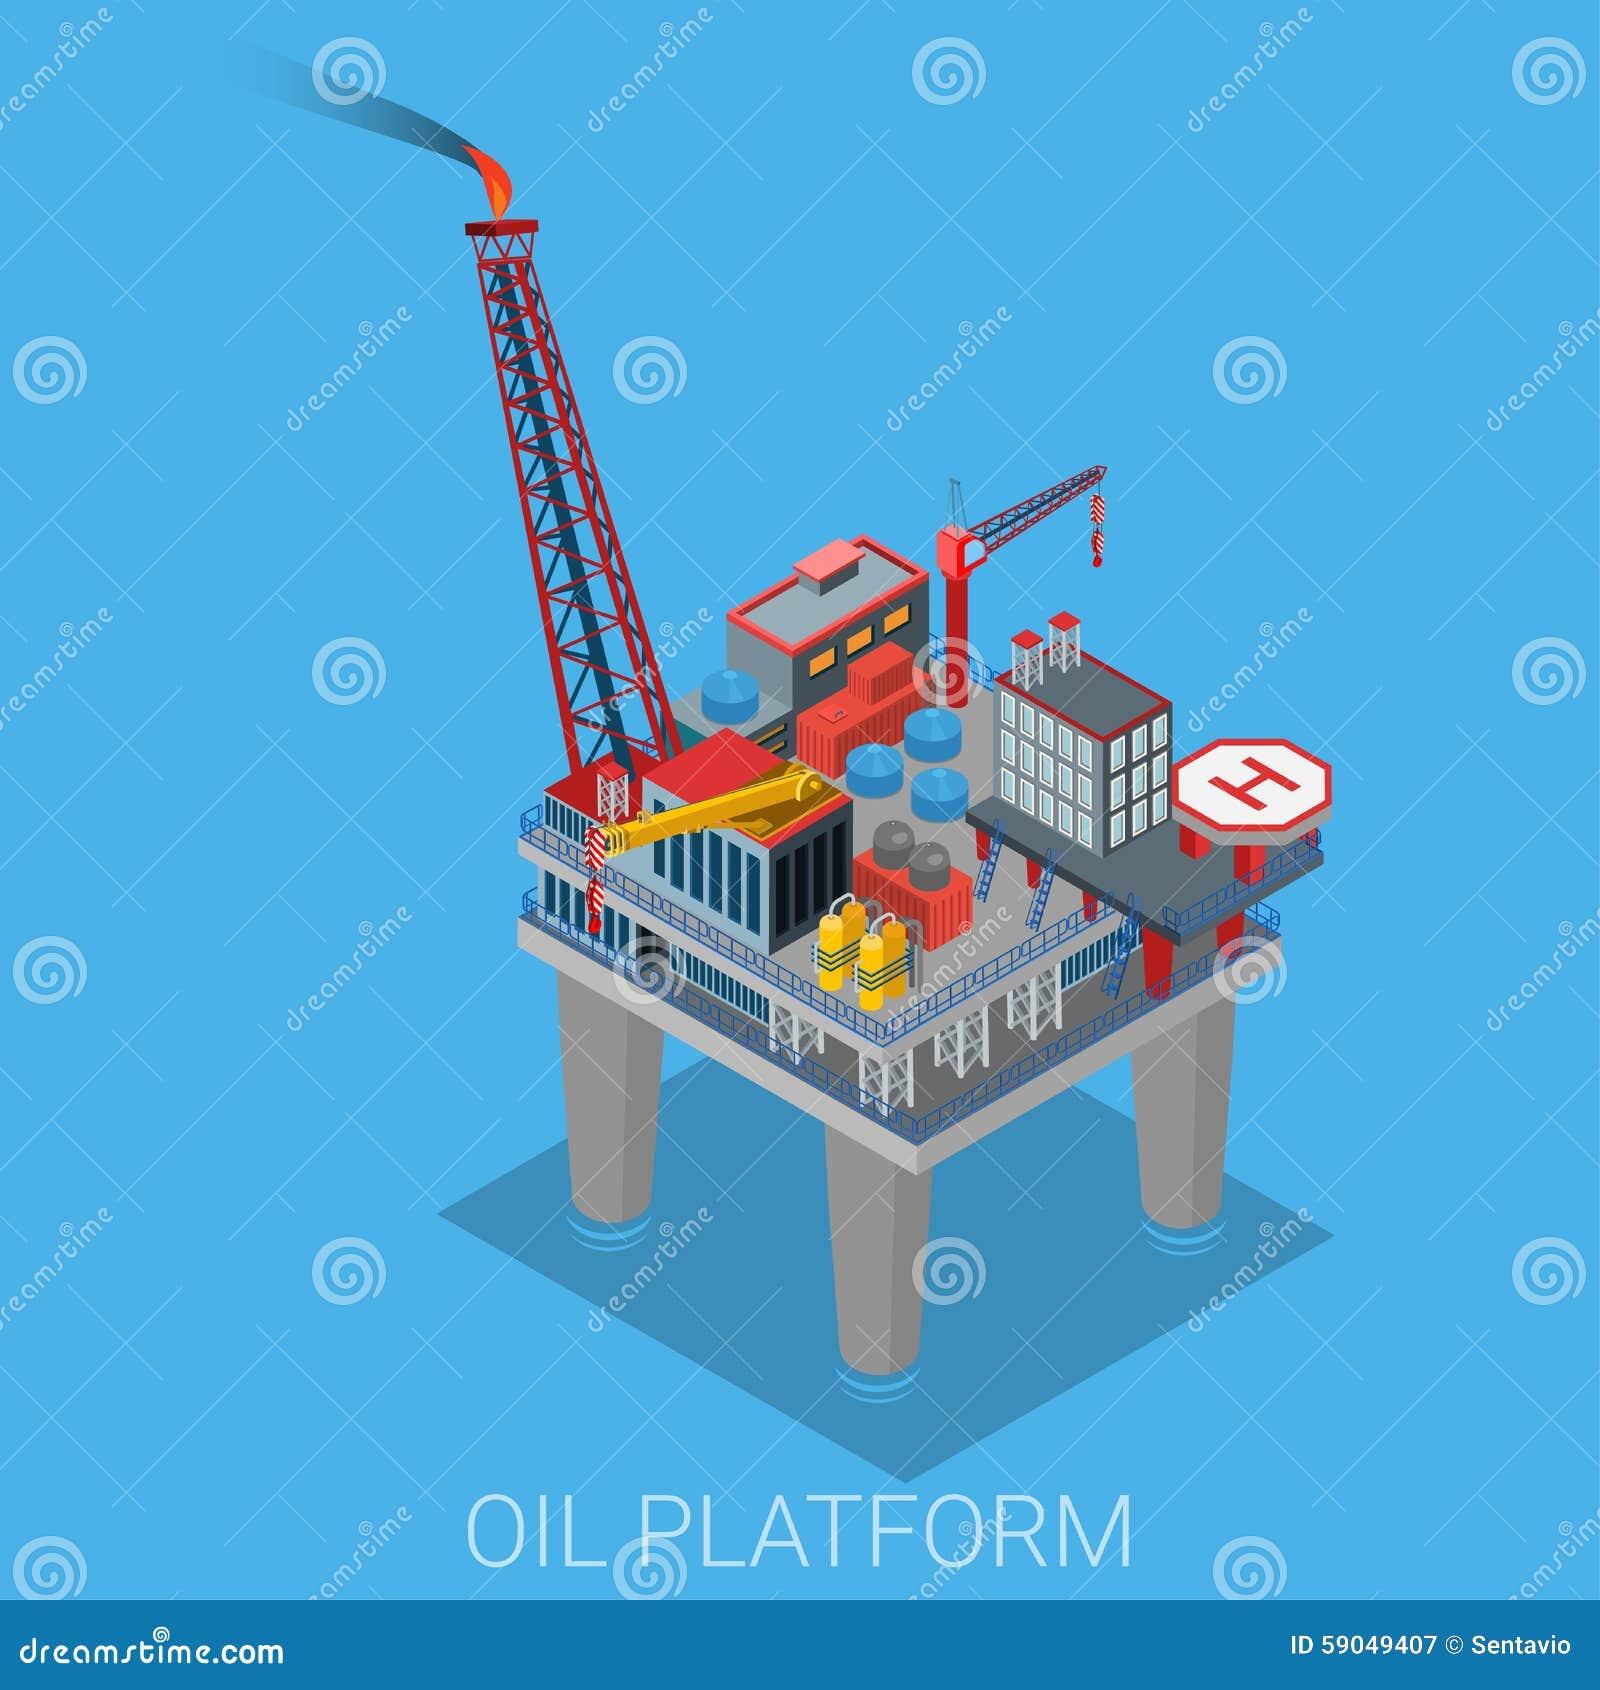 Sea oil extraction platform with helipad